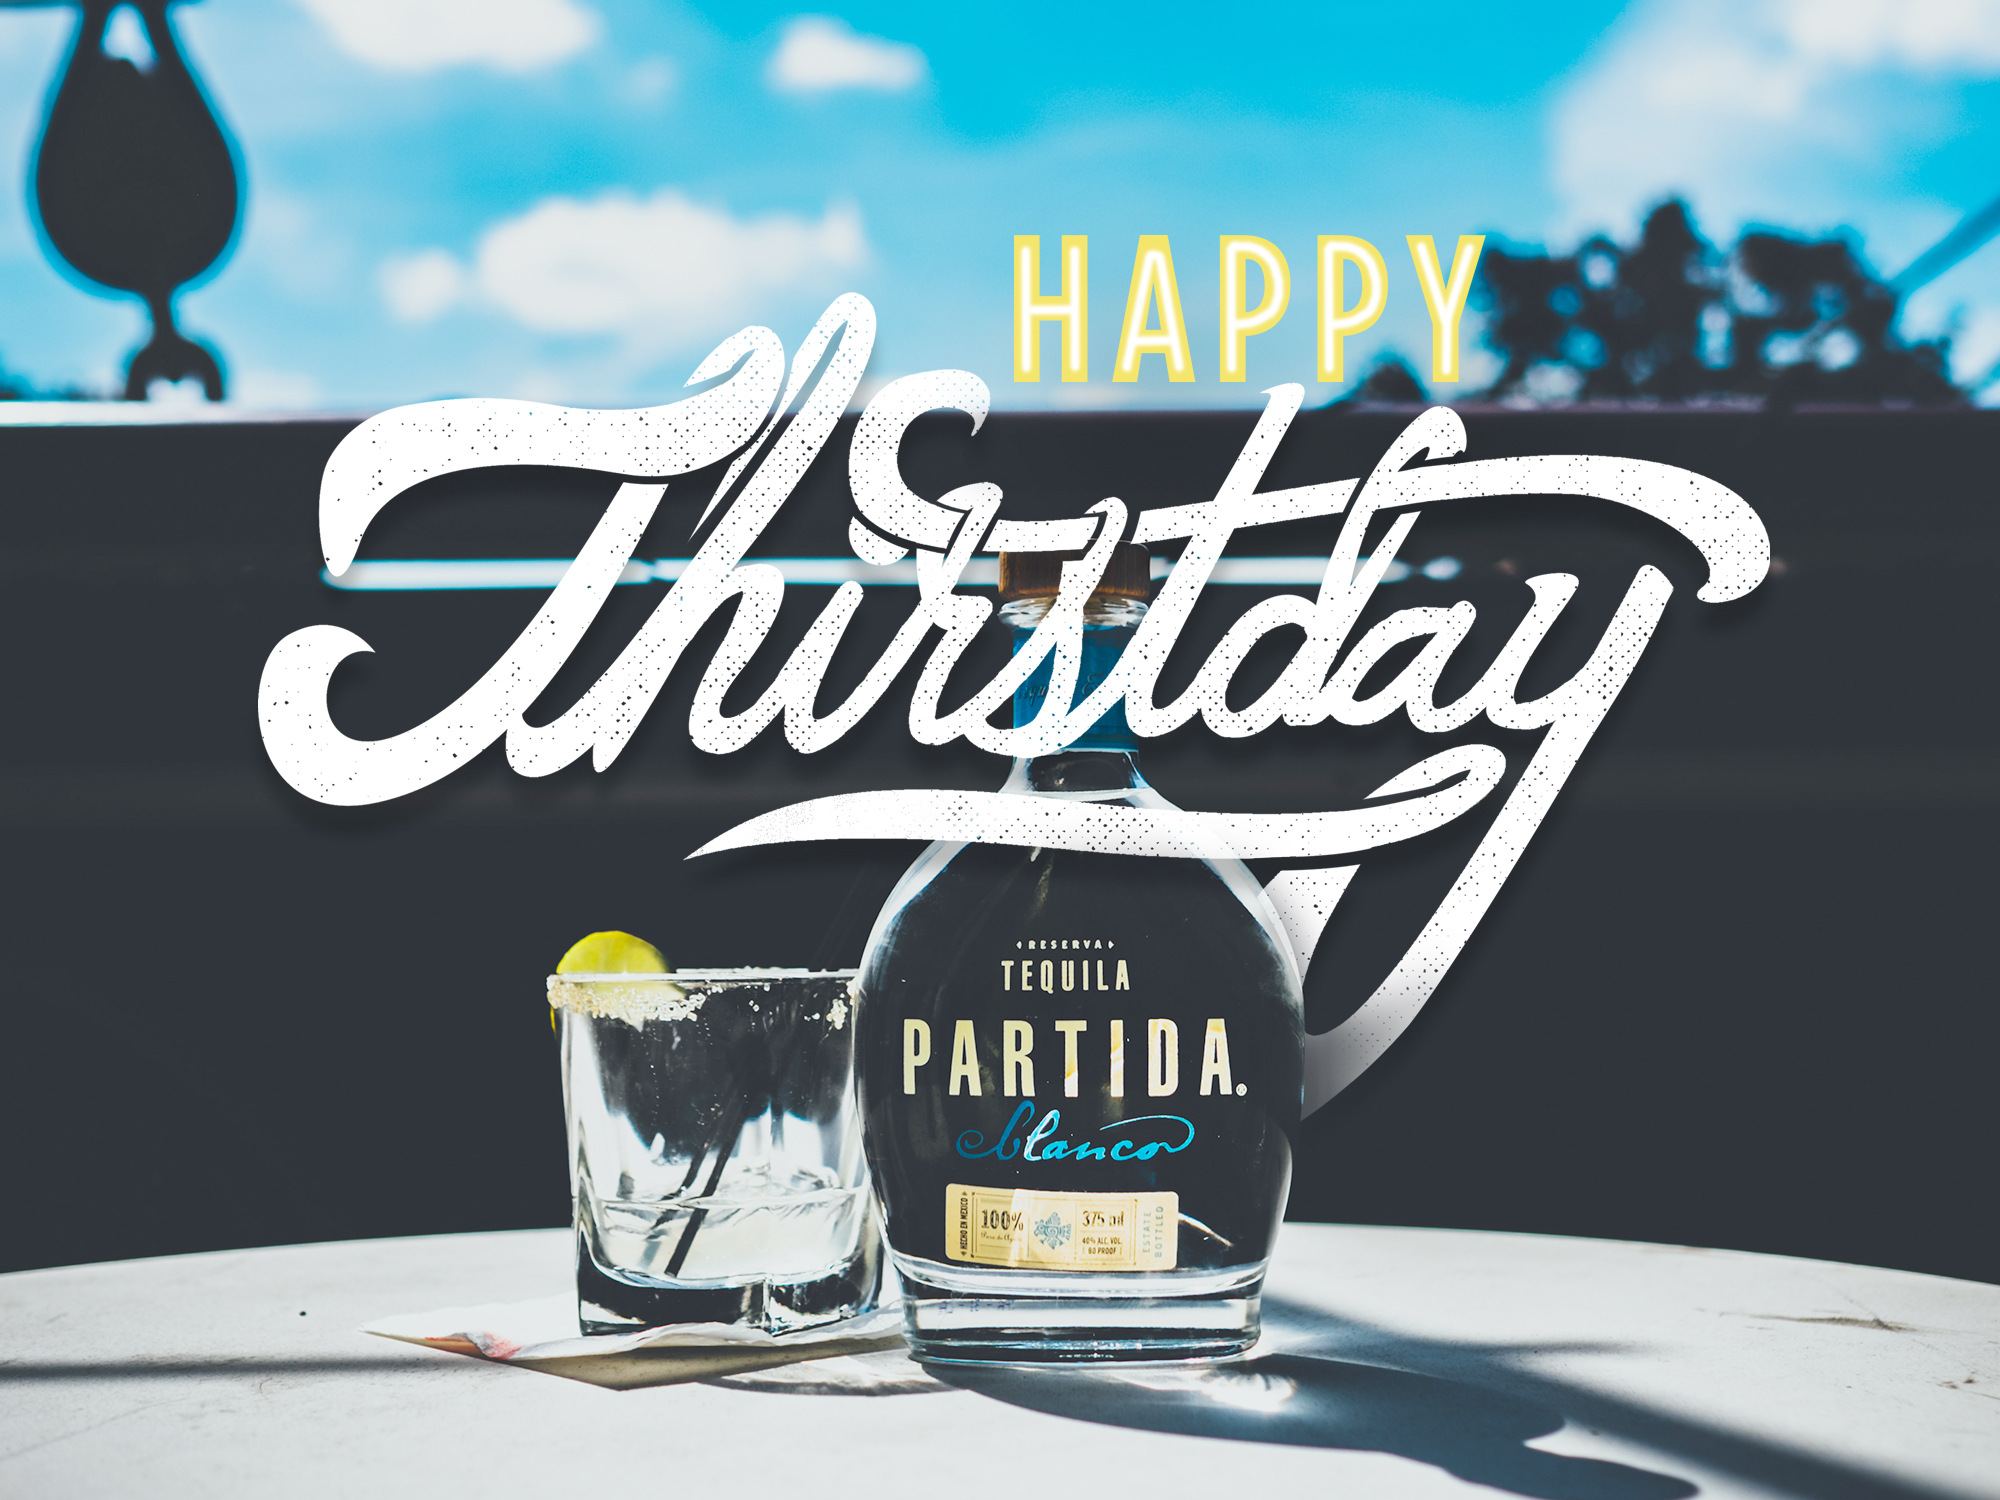 Tequila-Partida-3.jpg